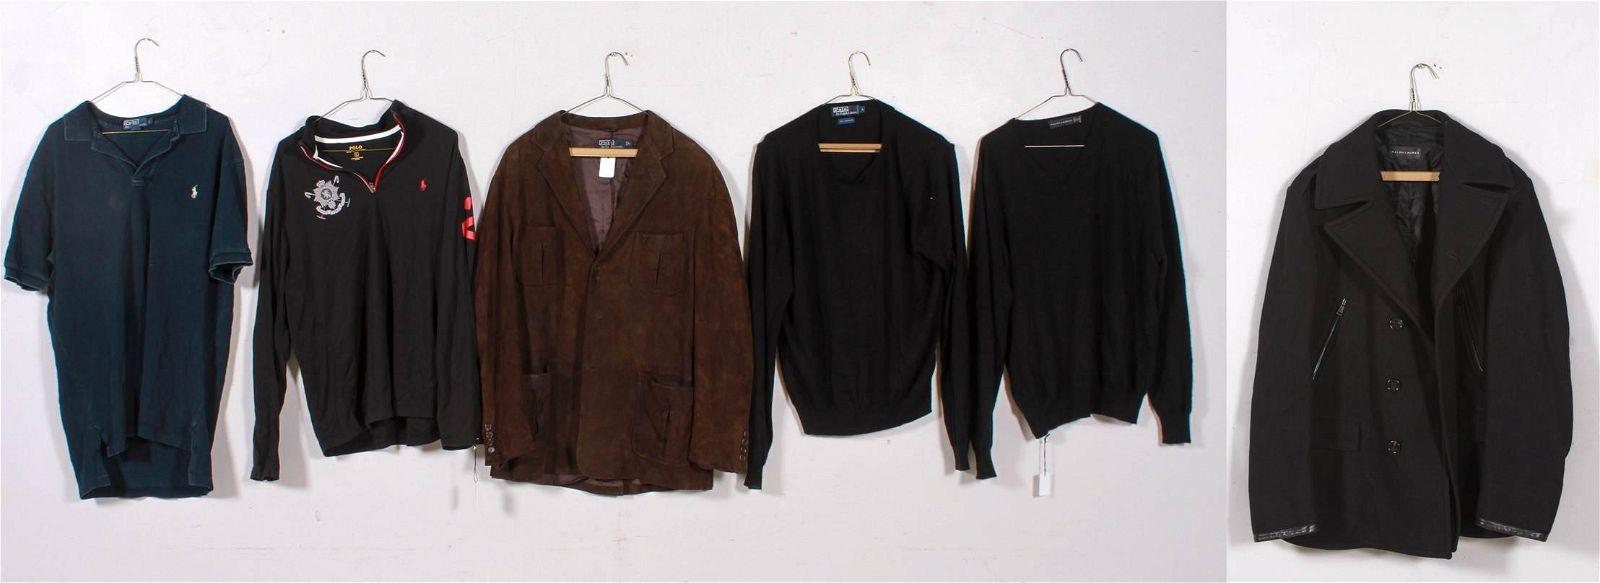 (6) Ralph Lauren and Polo Garments